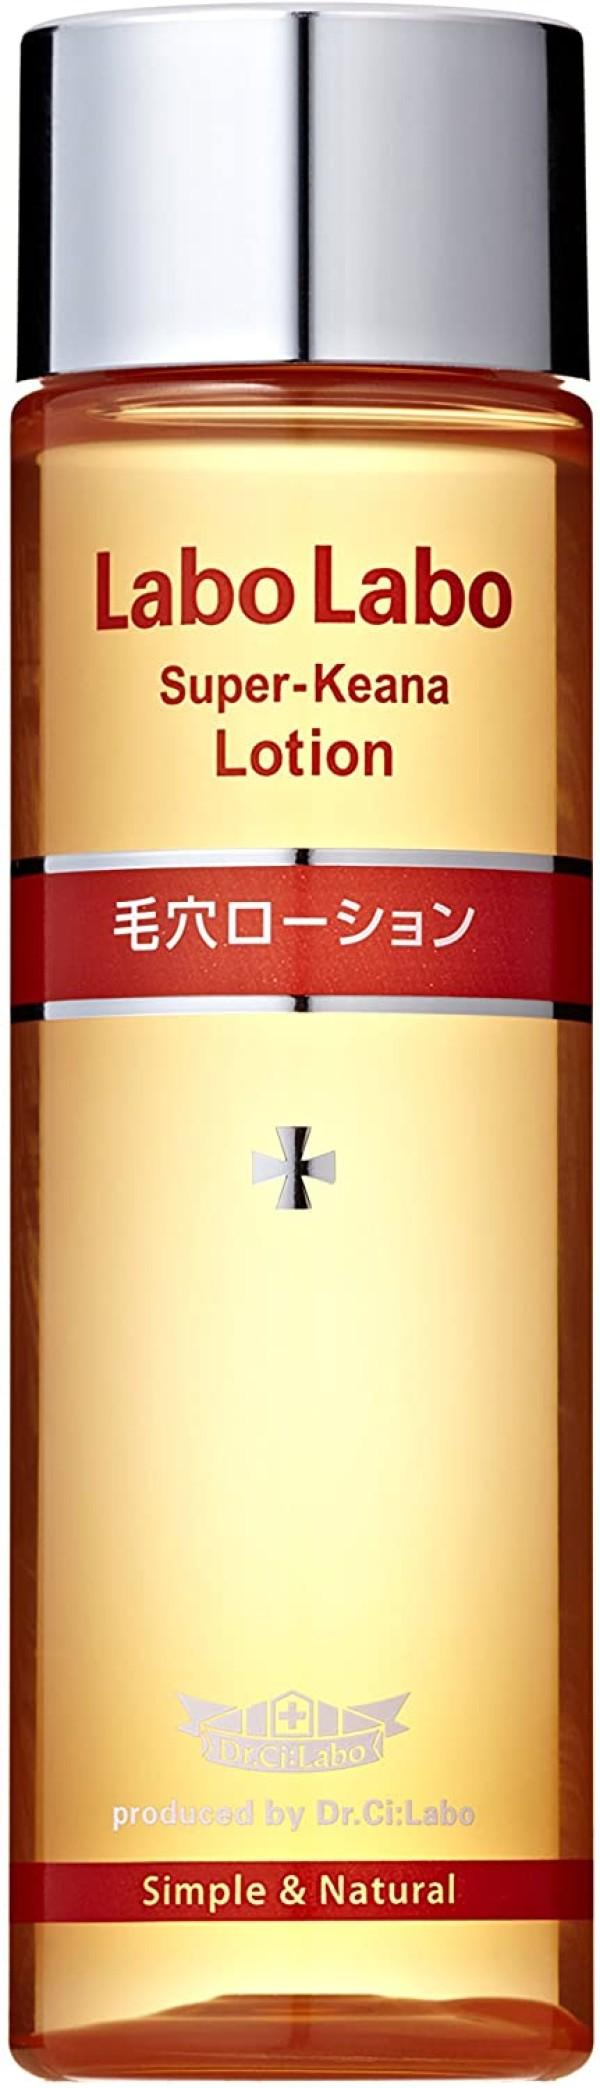 Dr.Ci: Labo Super-Keana Lotion